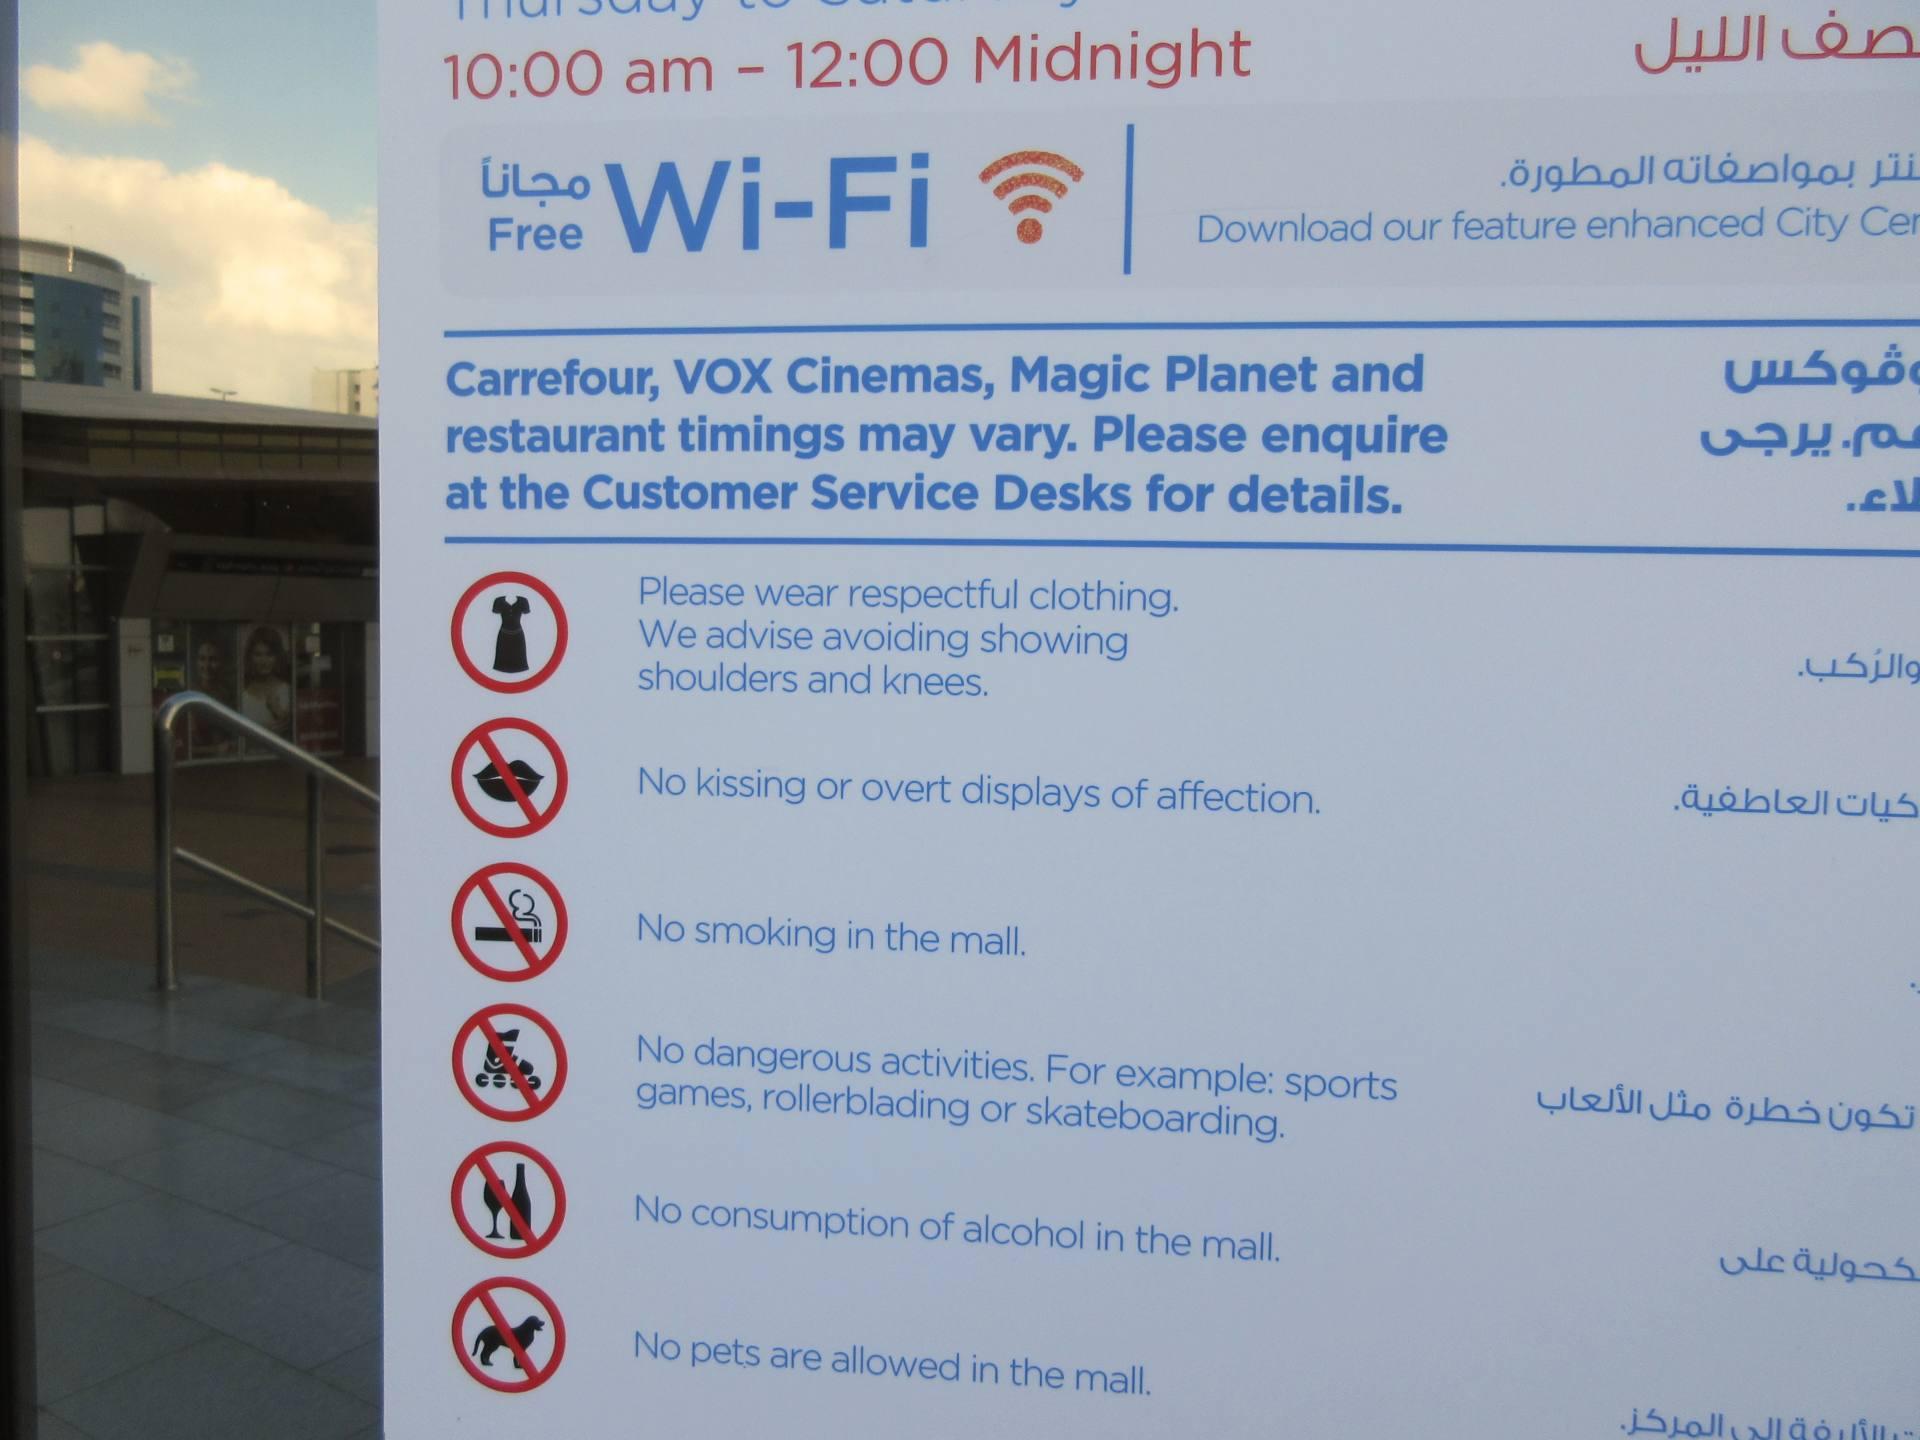 Dubai shopping mall haul - cover your knees